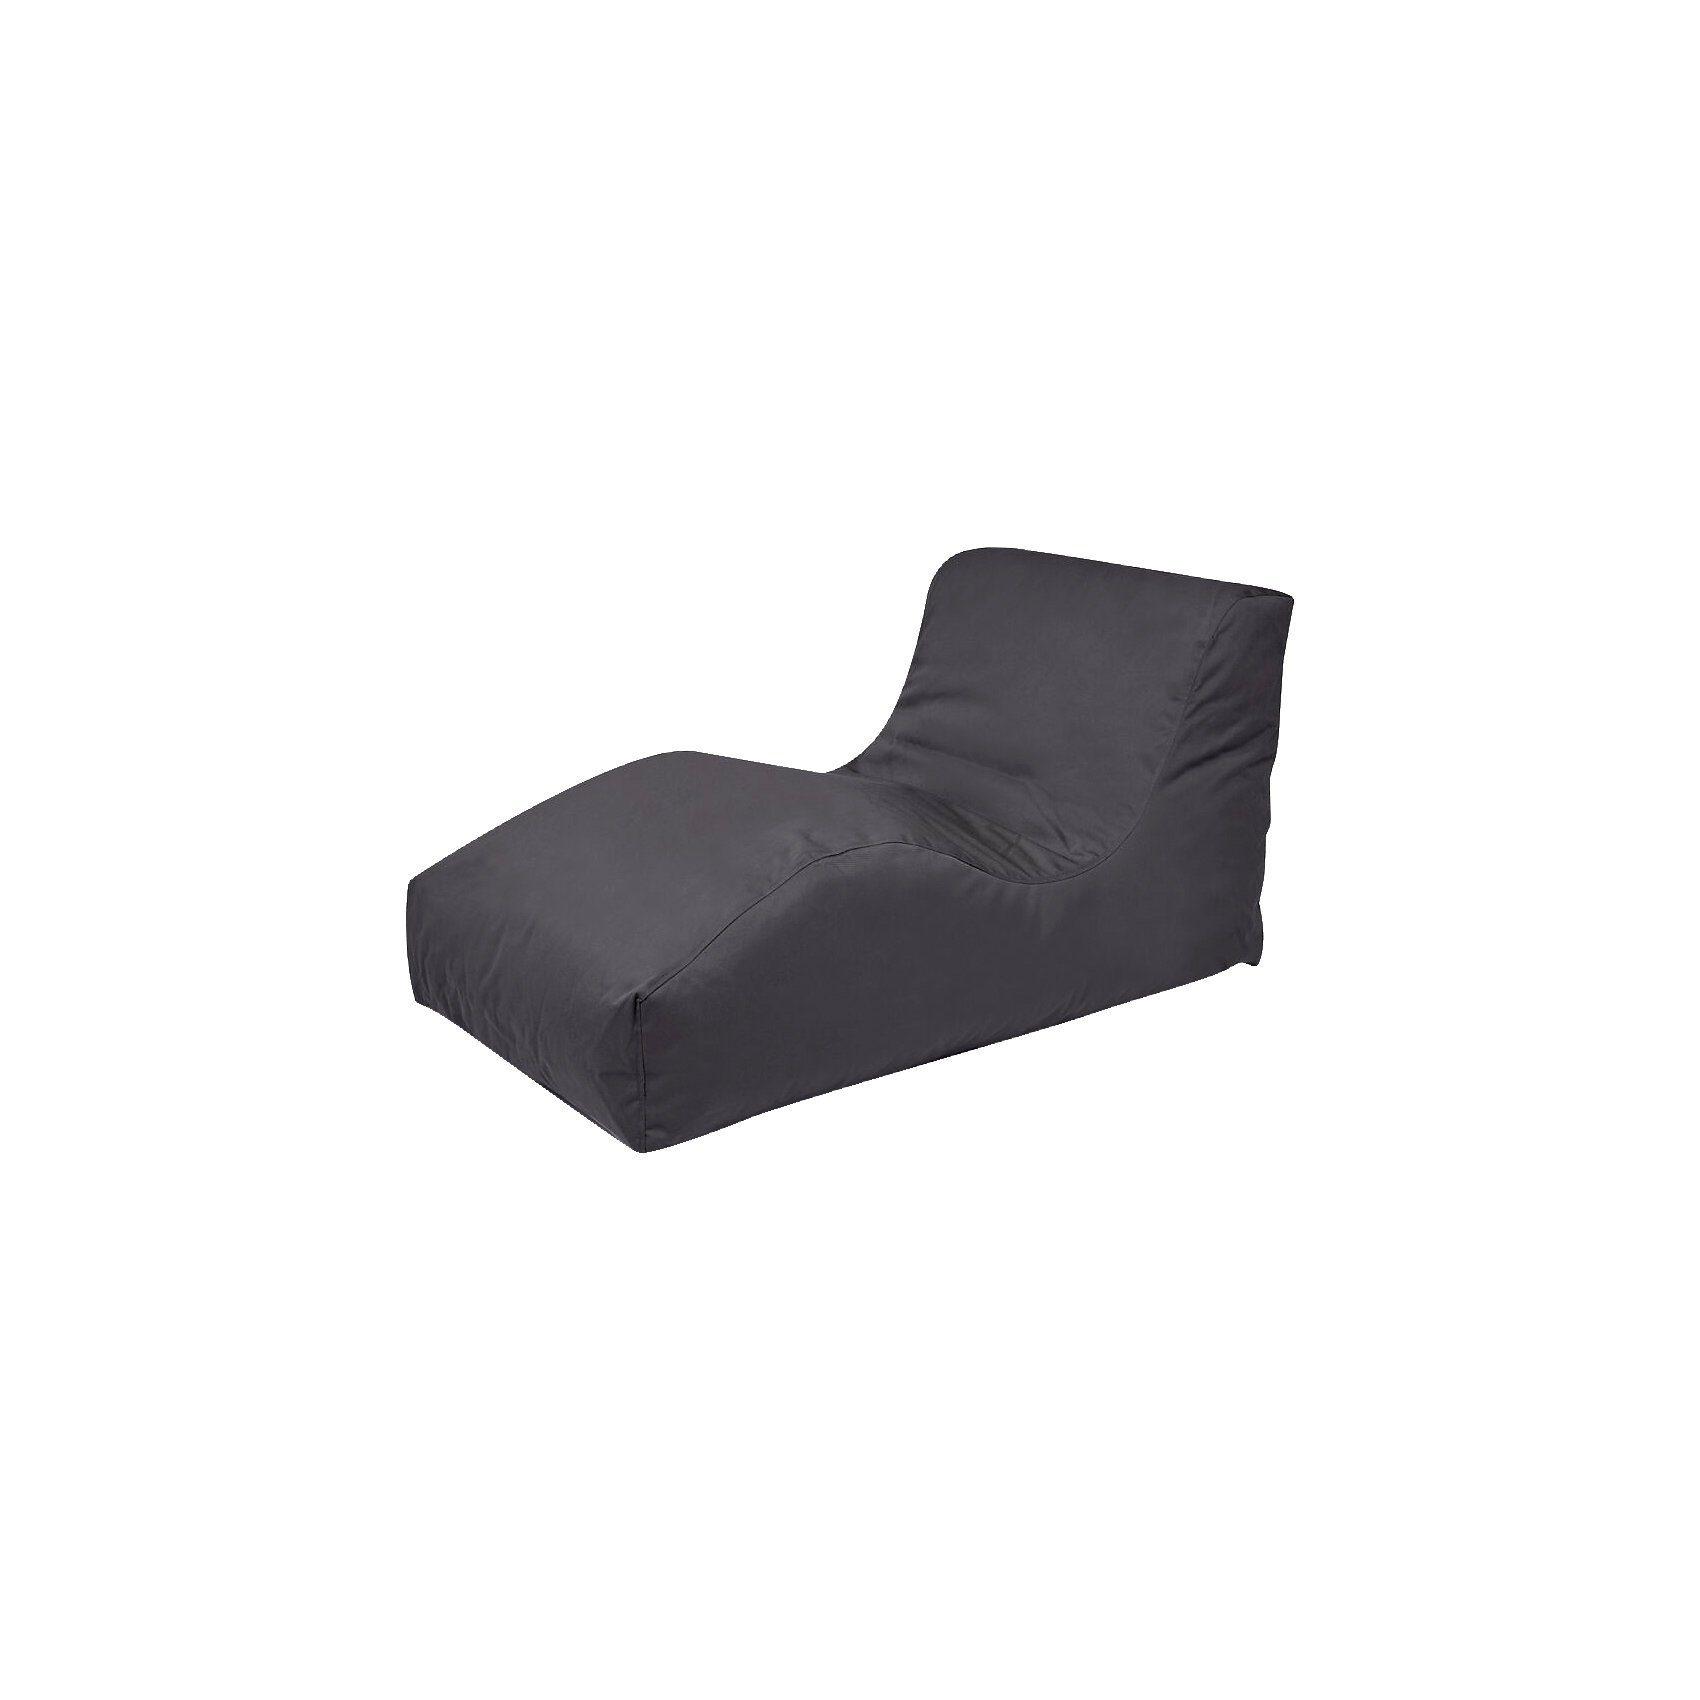 Outdoor-Sitzsack Wave, Plus, anthrazit